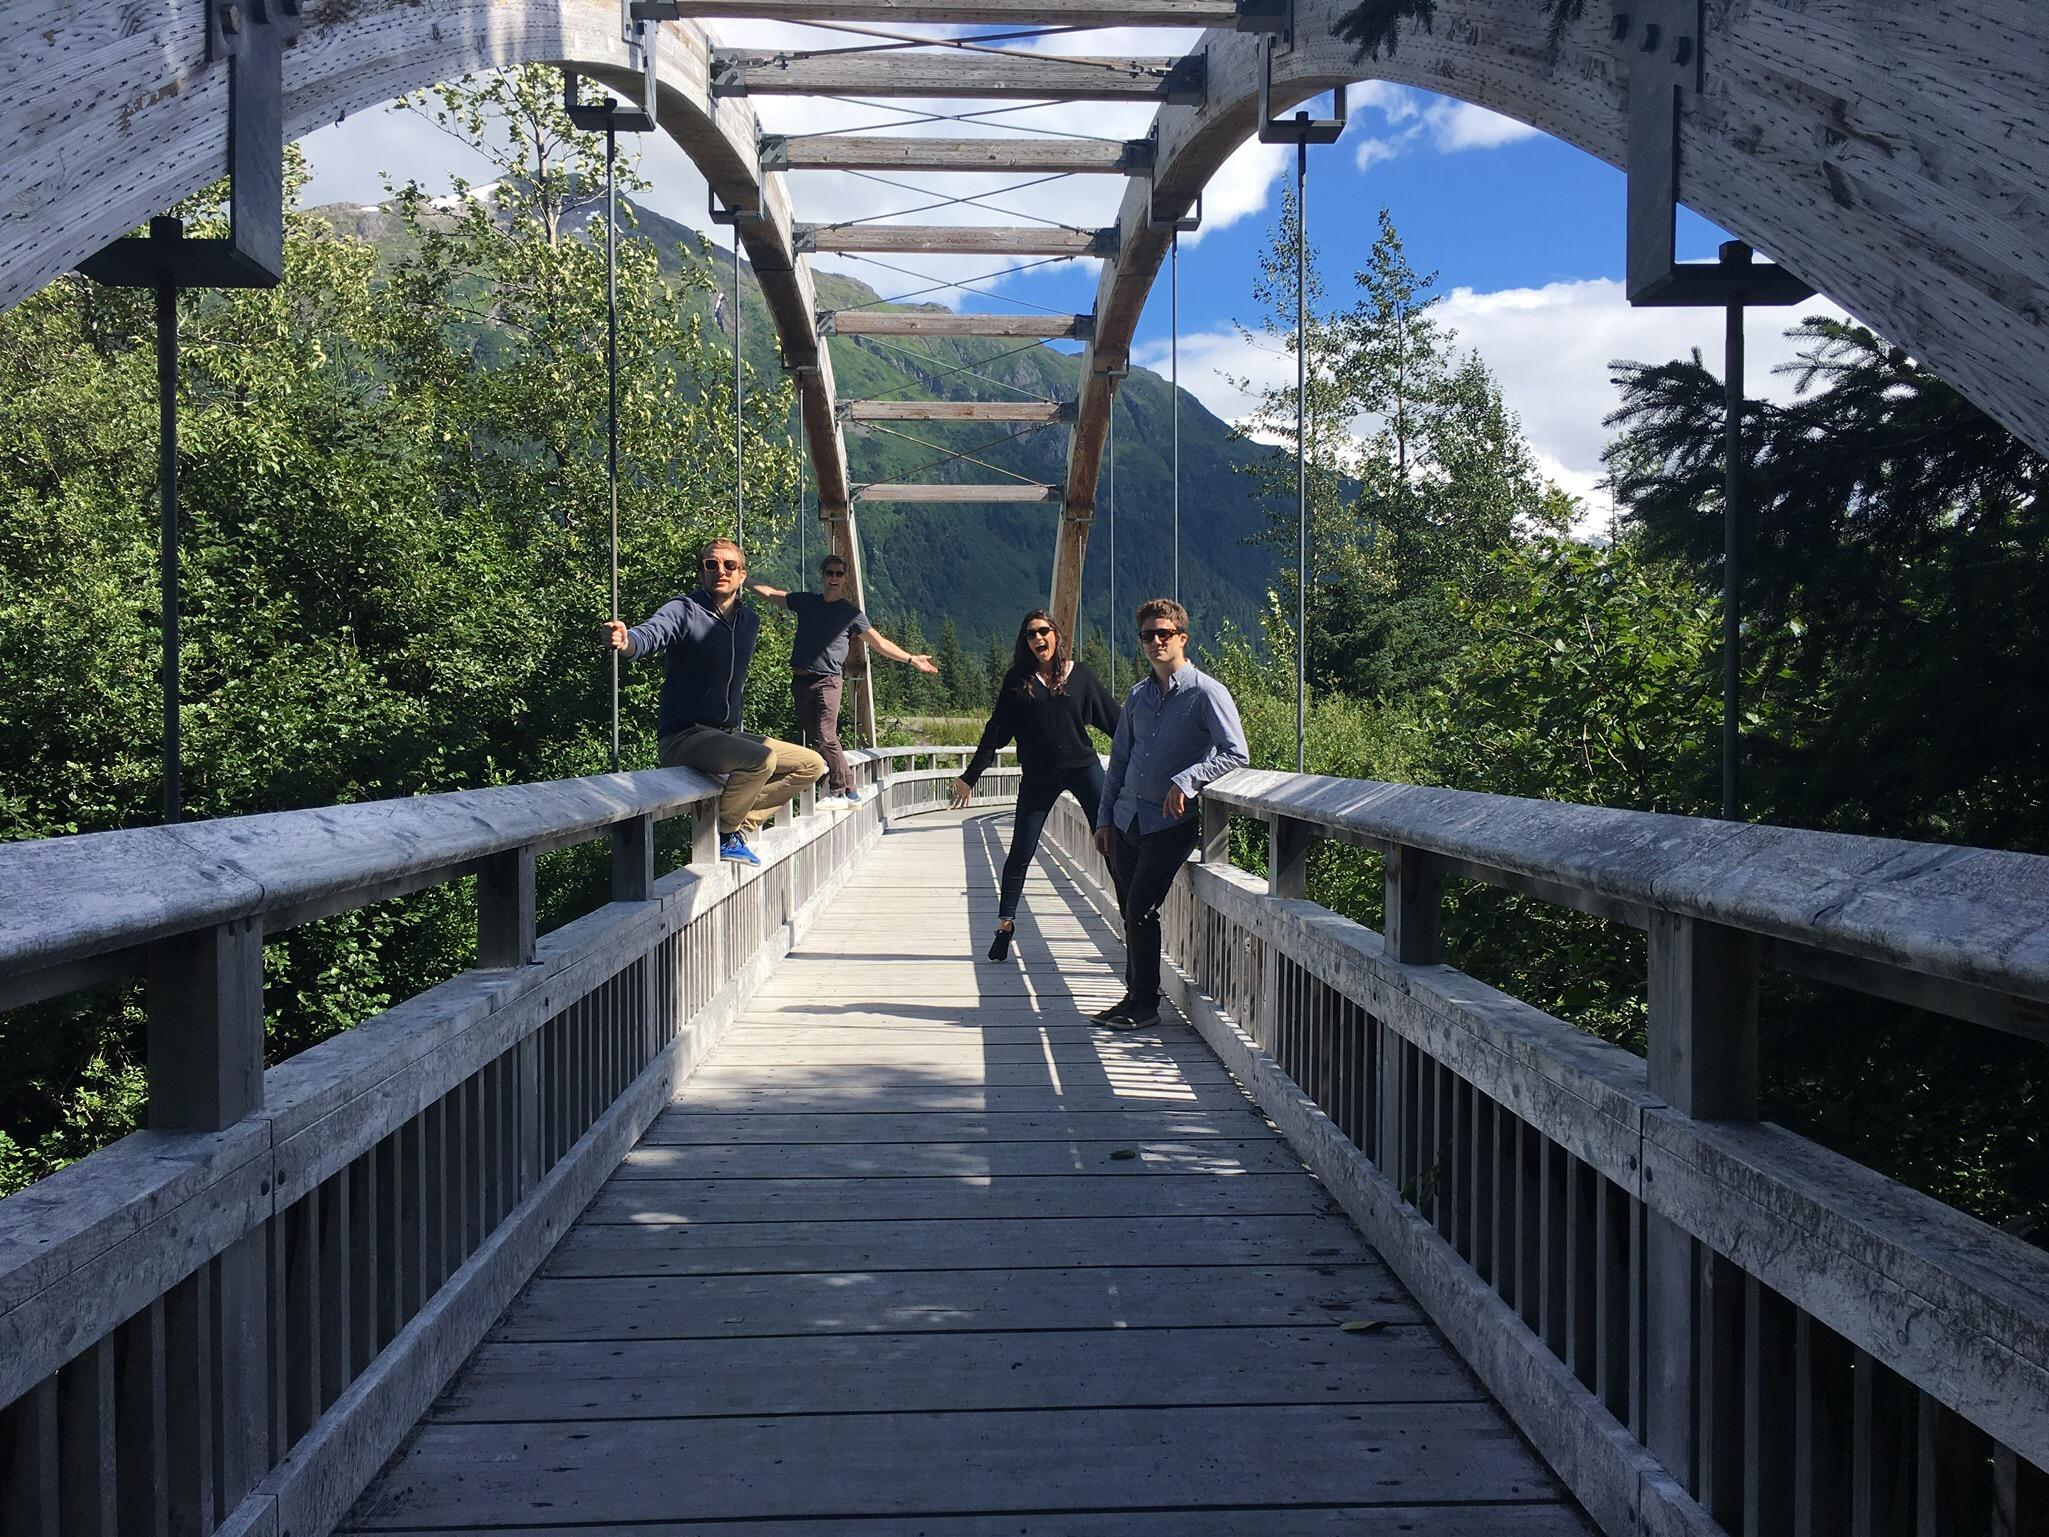 Alaska Bridge - The Kissters